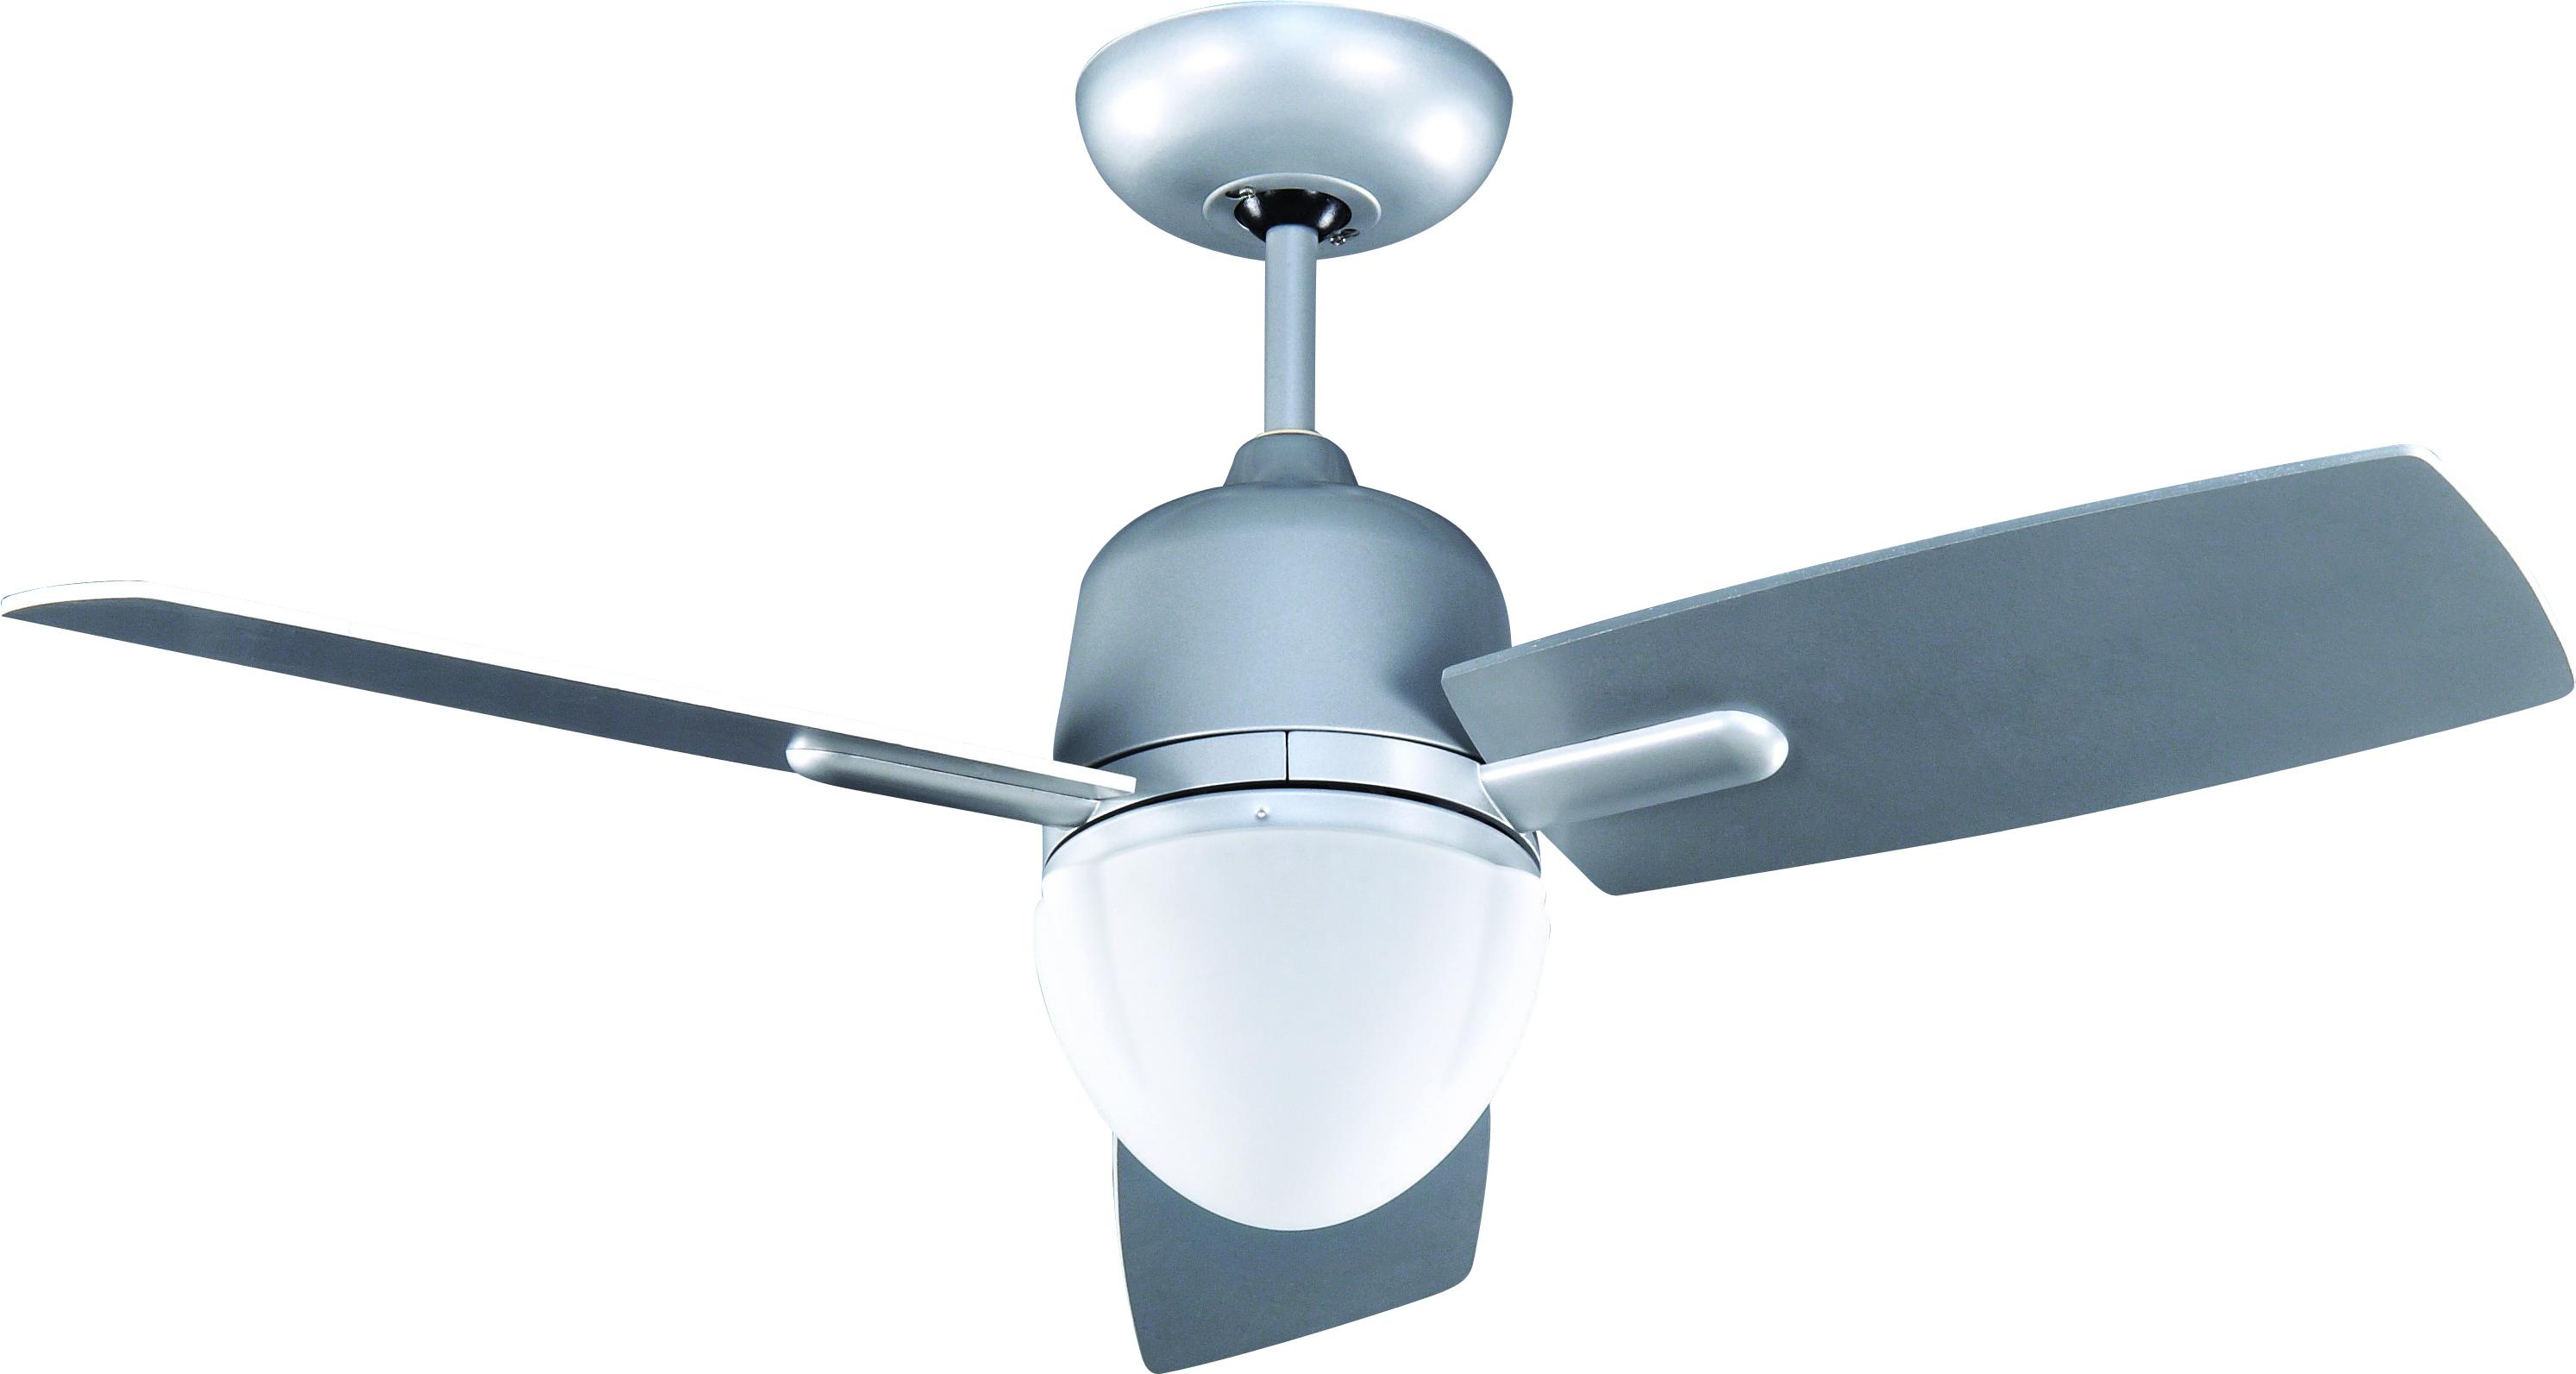 15057【Light Fan】Aichi ,  BLDC Brushless DC/Silver